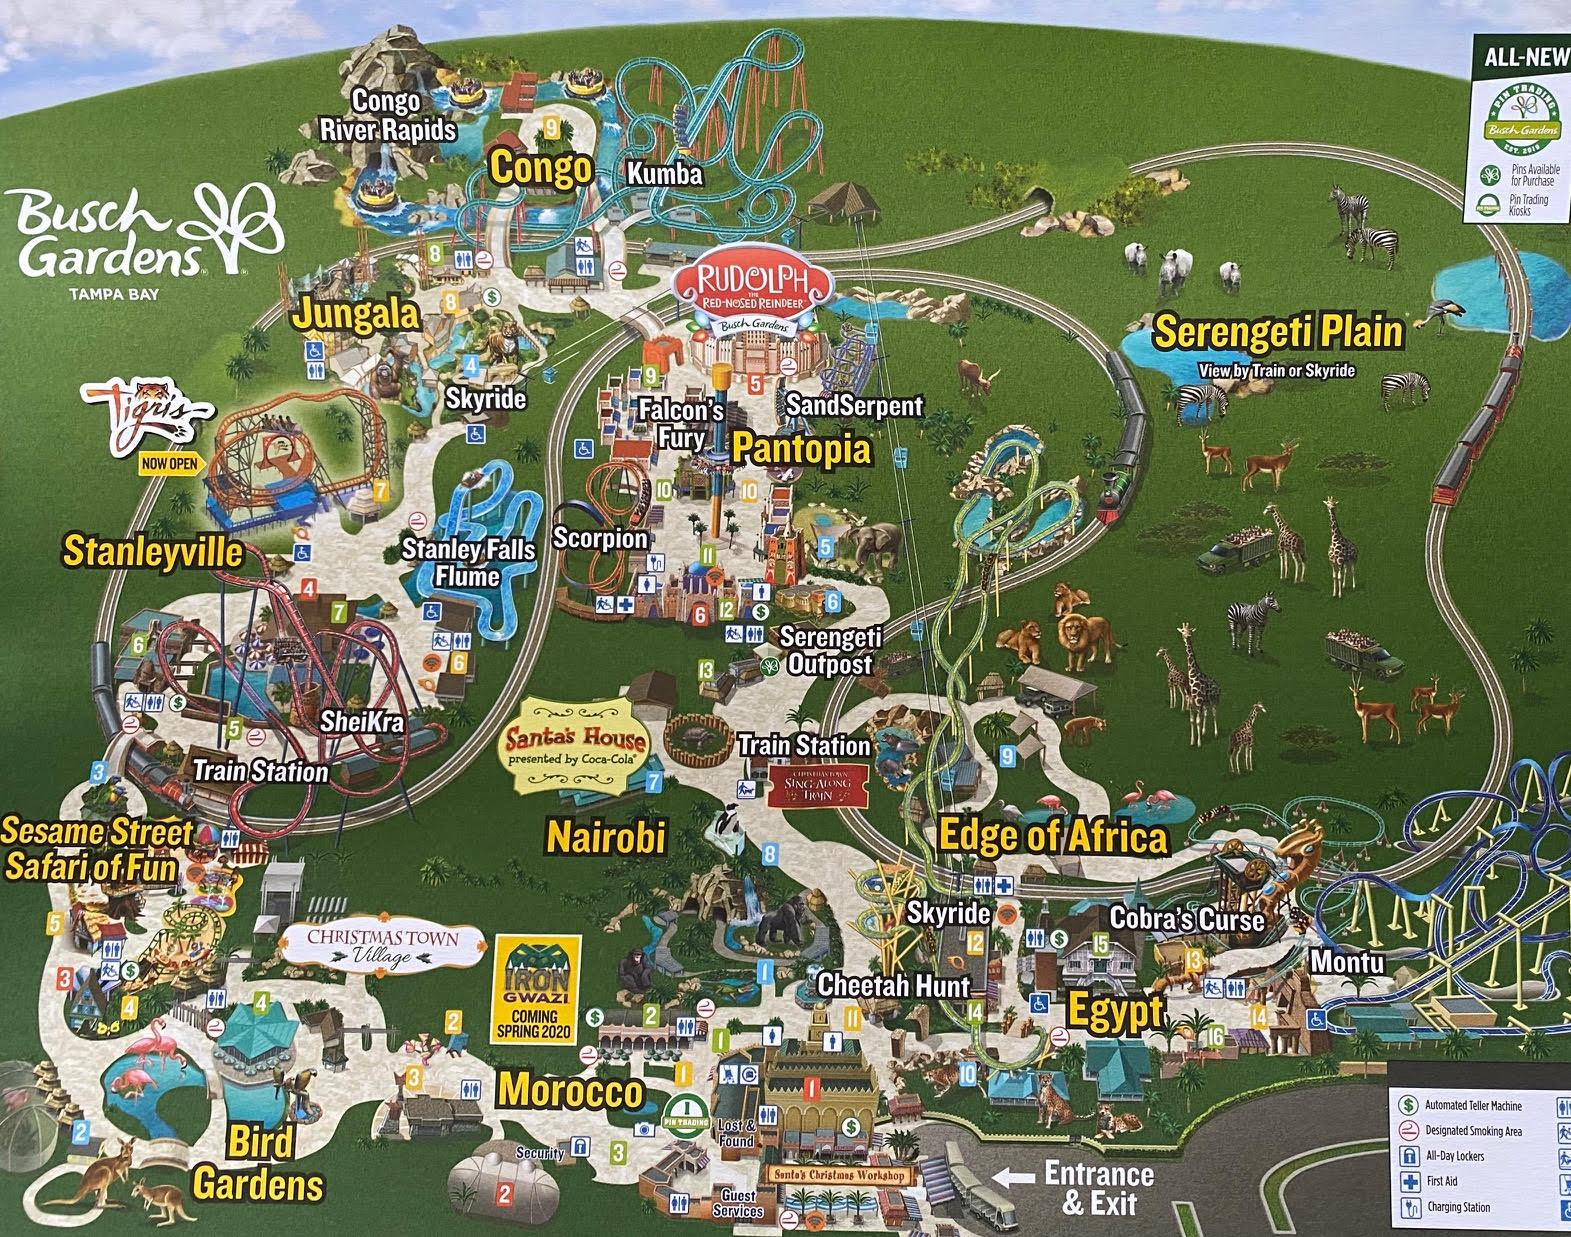 Busch Gardens Christmas Town 2020 A Visit to Christmas Town in Busch Gardens Tampa Bay